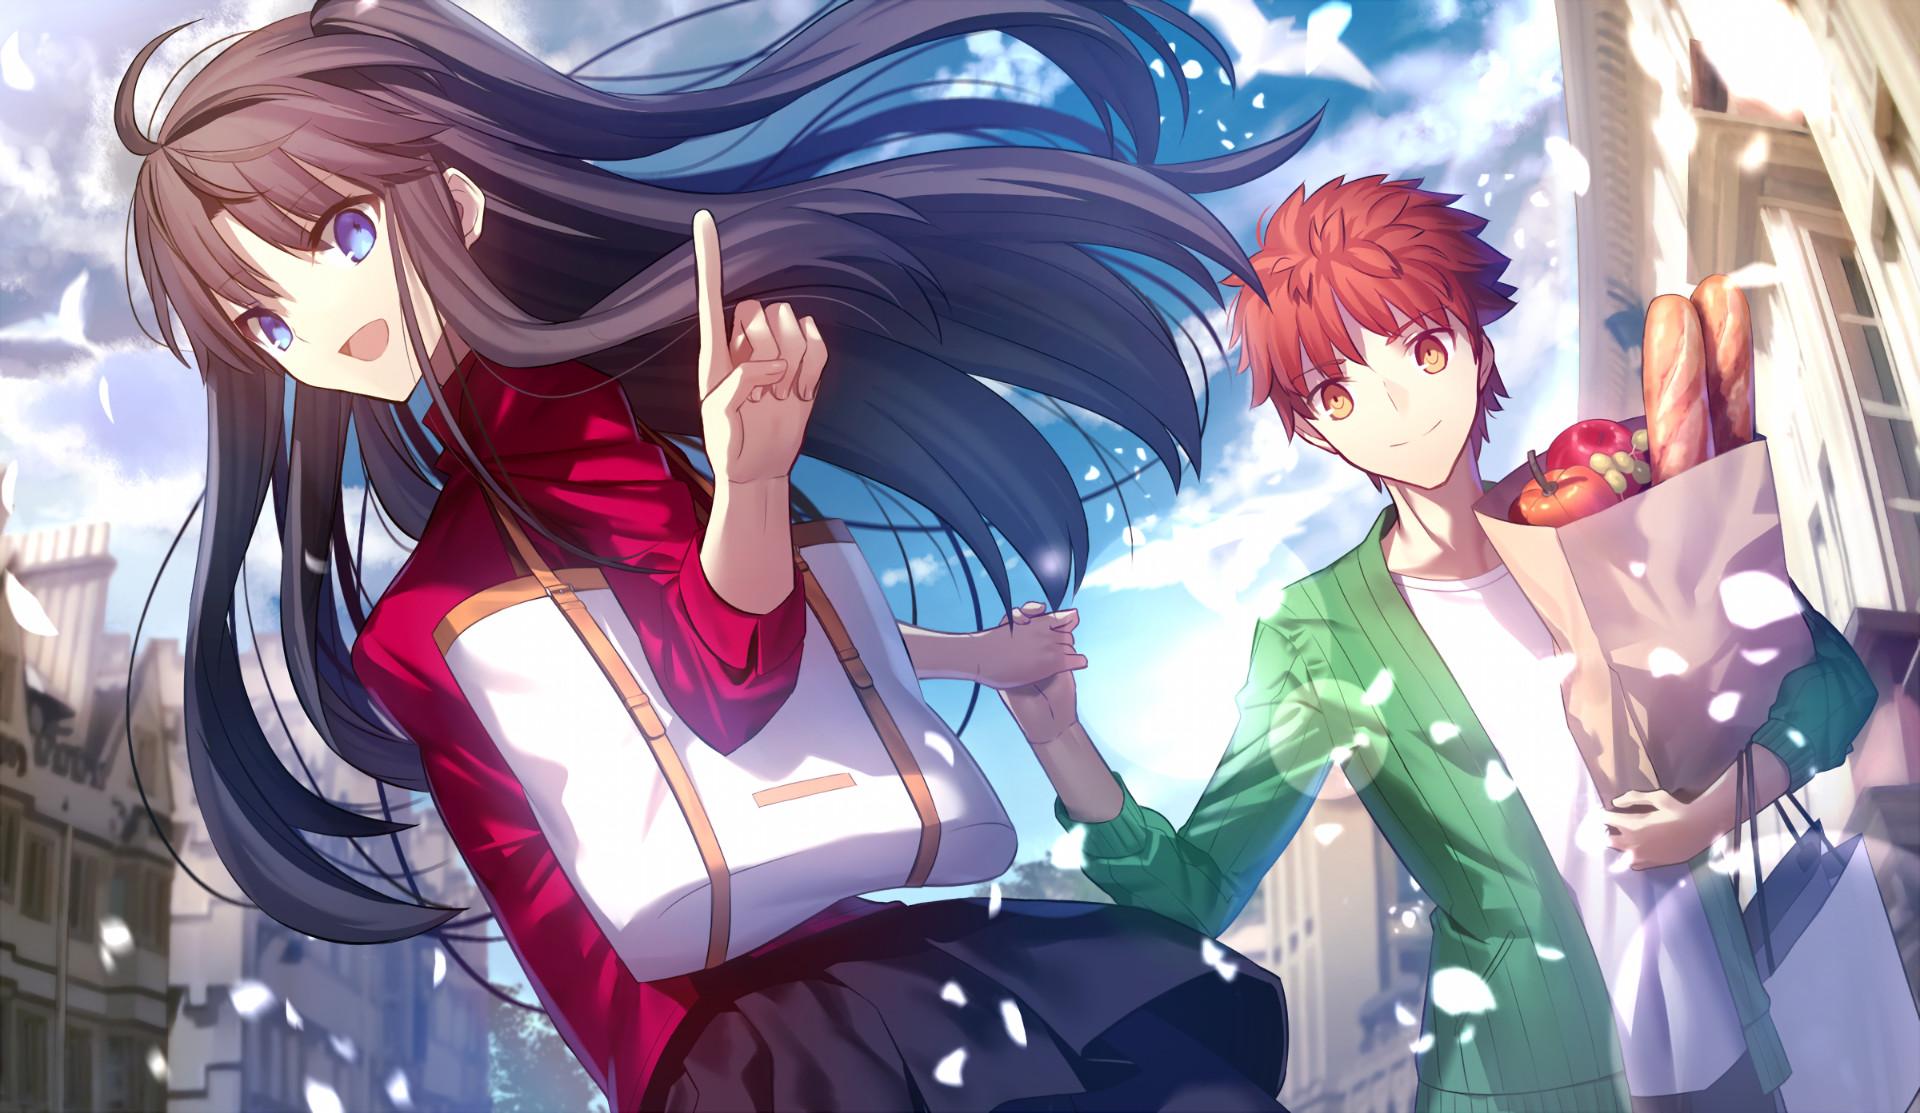 HD Wallpaper | Hintergrund ID:706478. Anime Fate/Stay Night: …